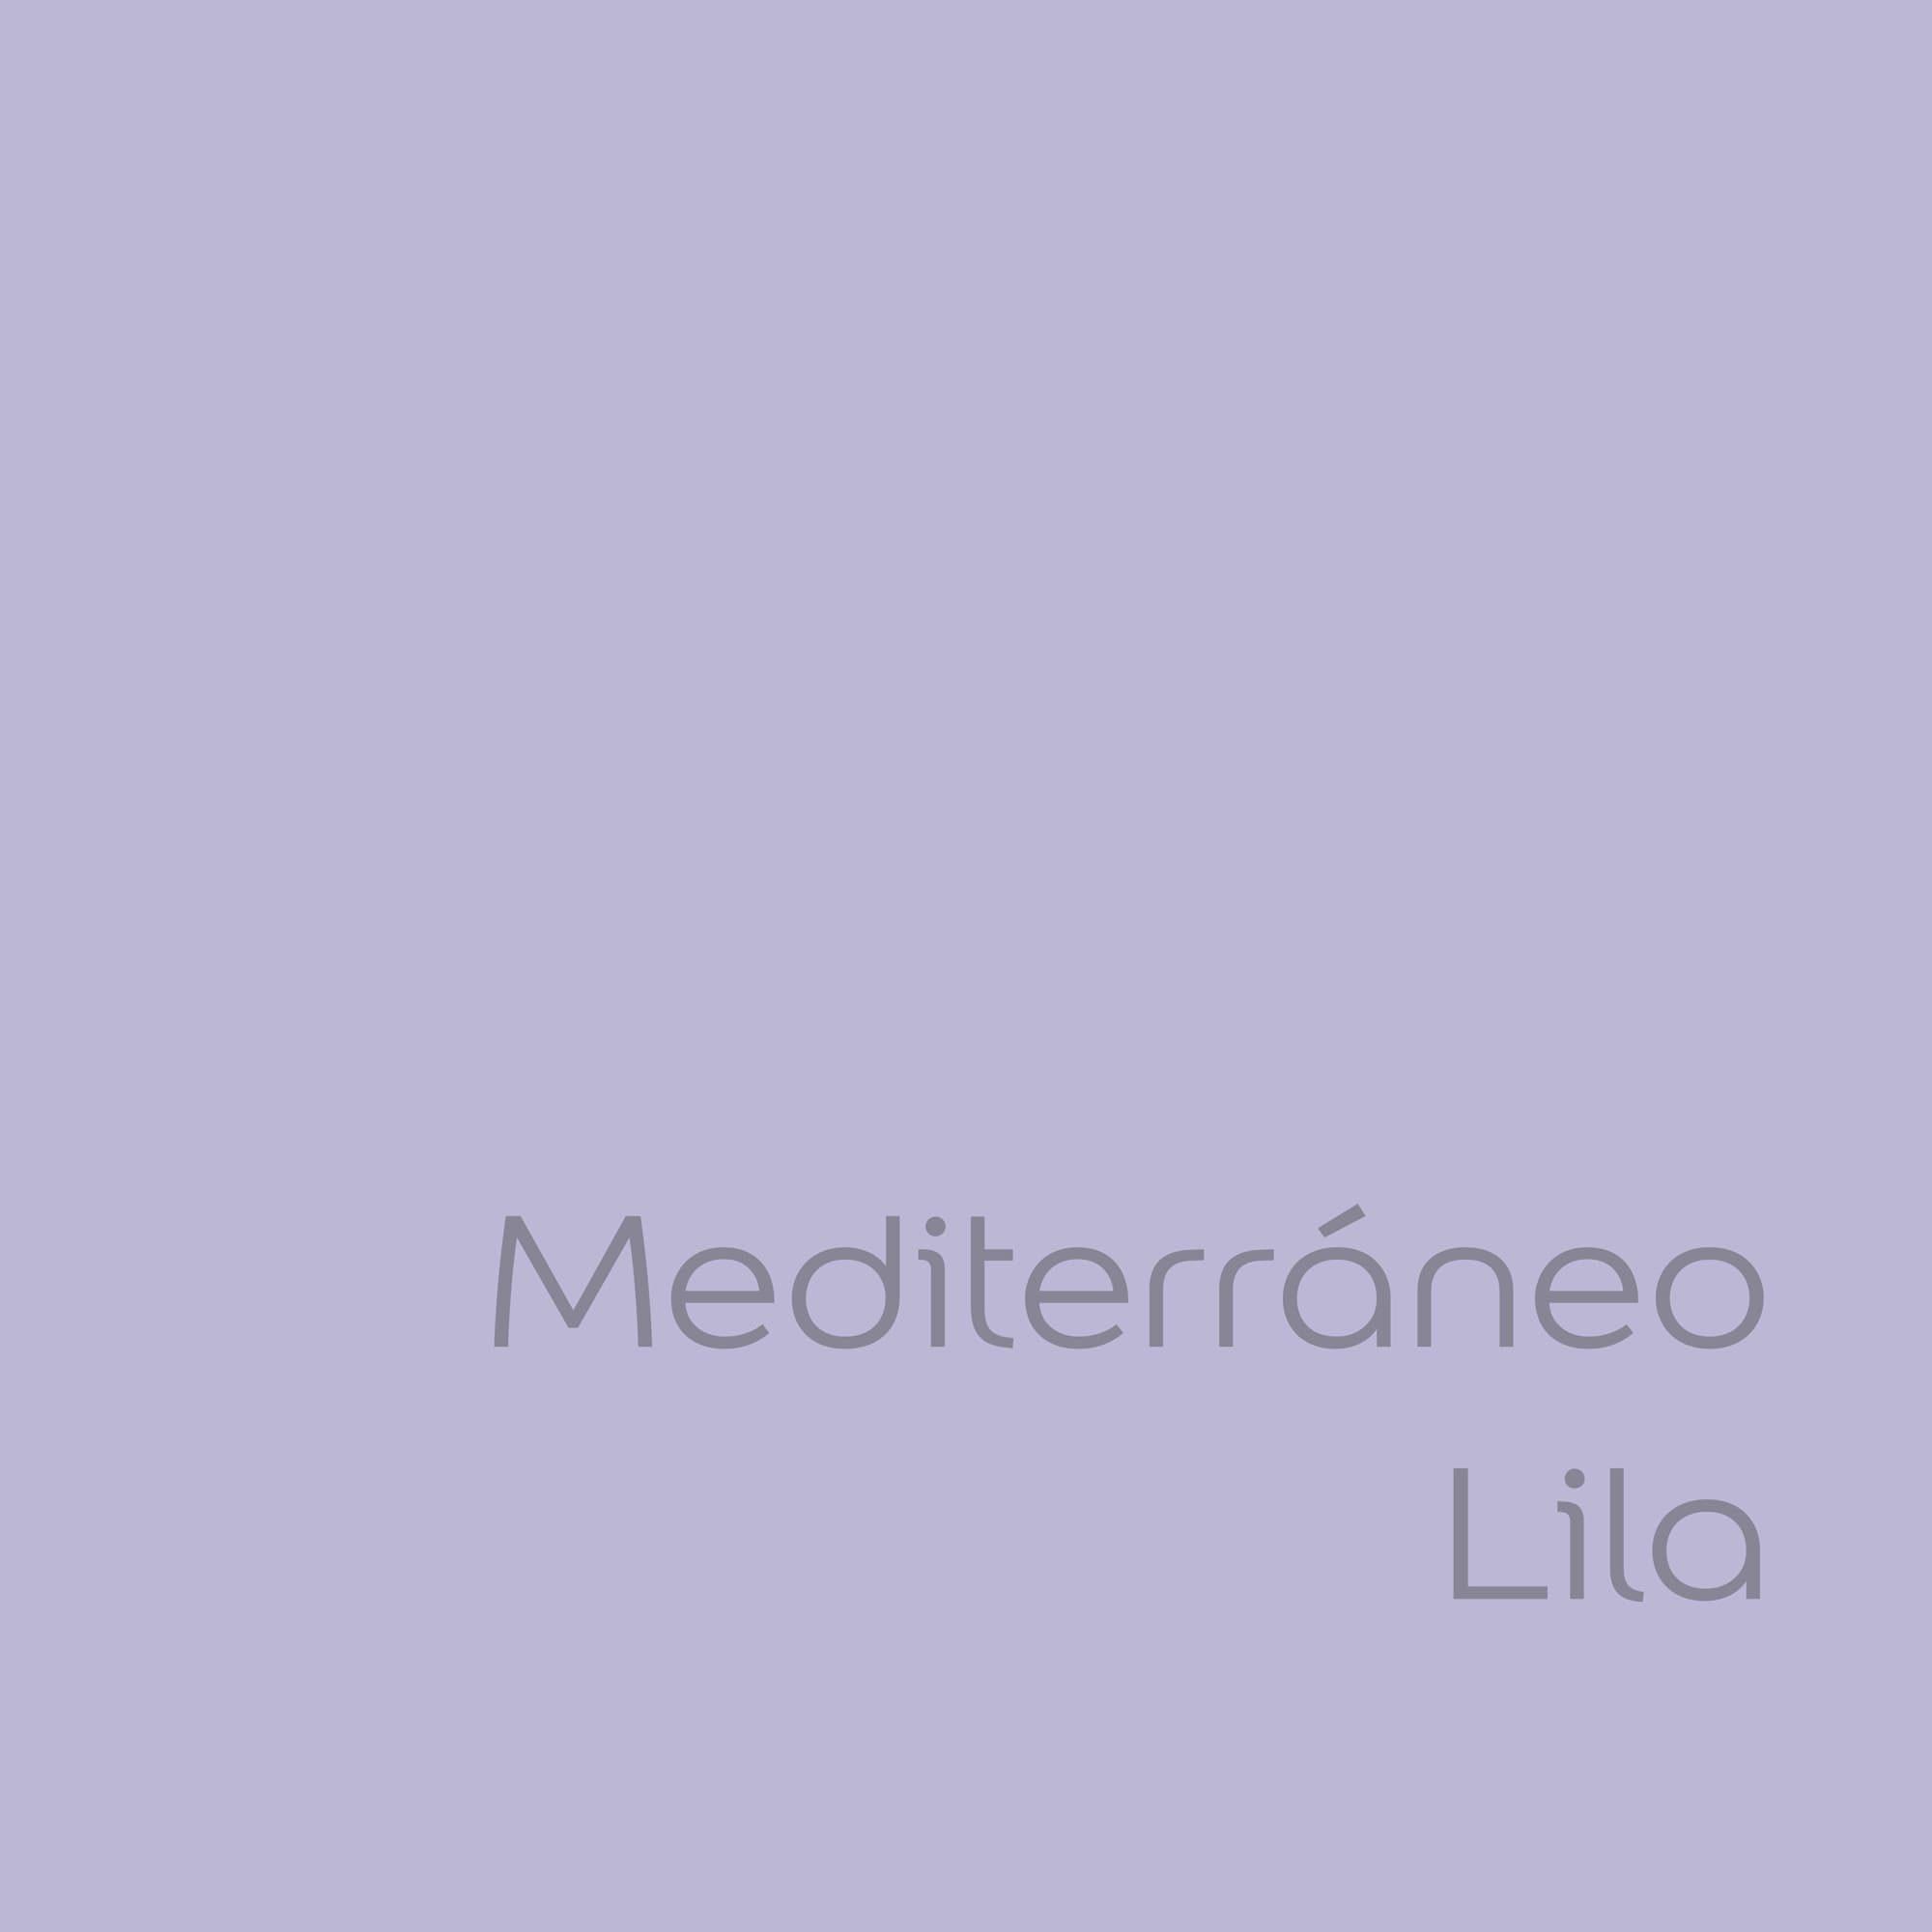 tester de color de pintura bruguer cdm mediterraneo lila color